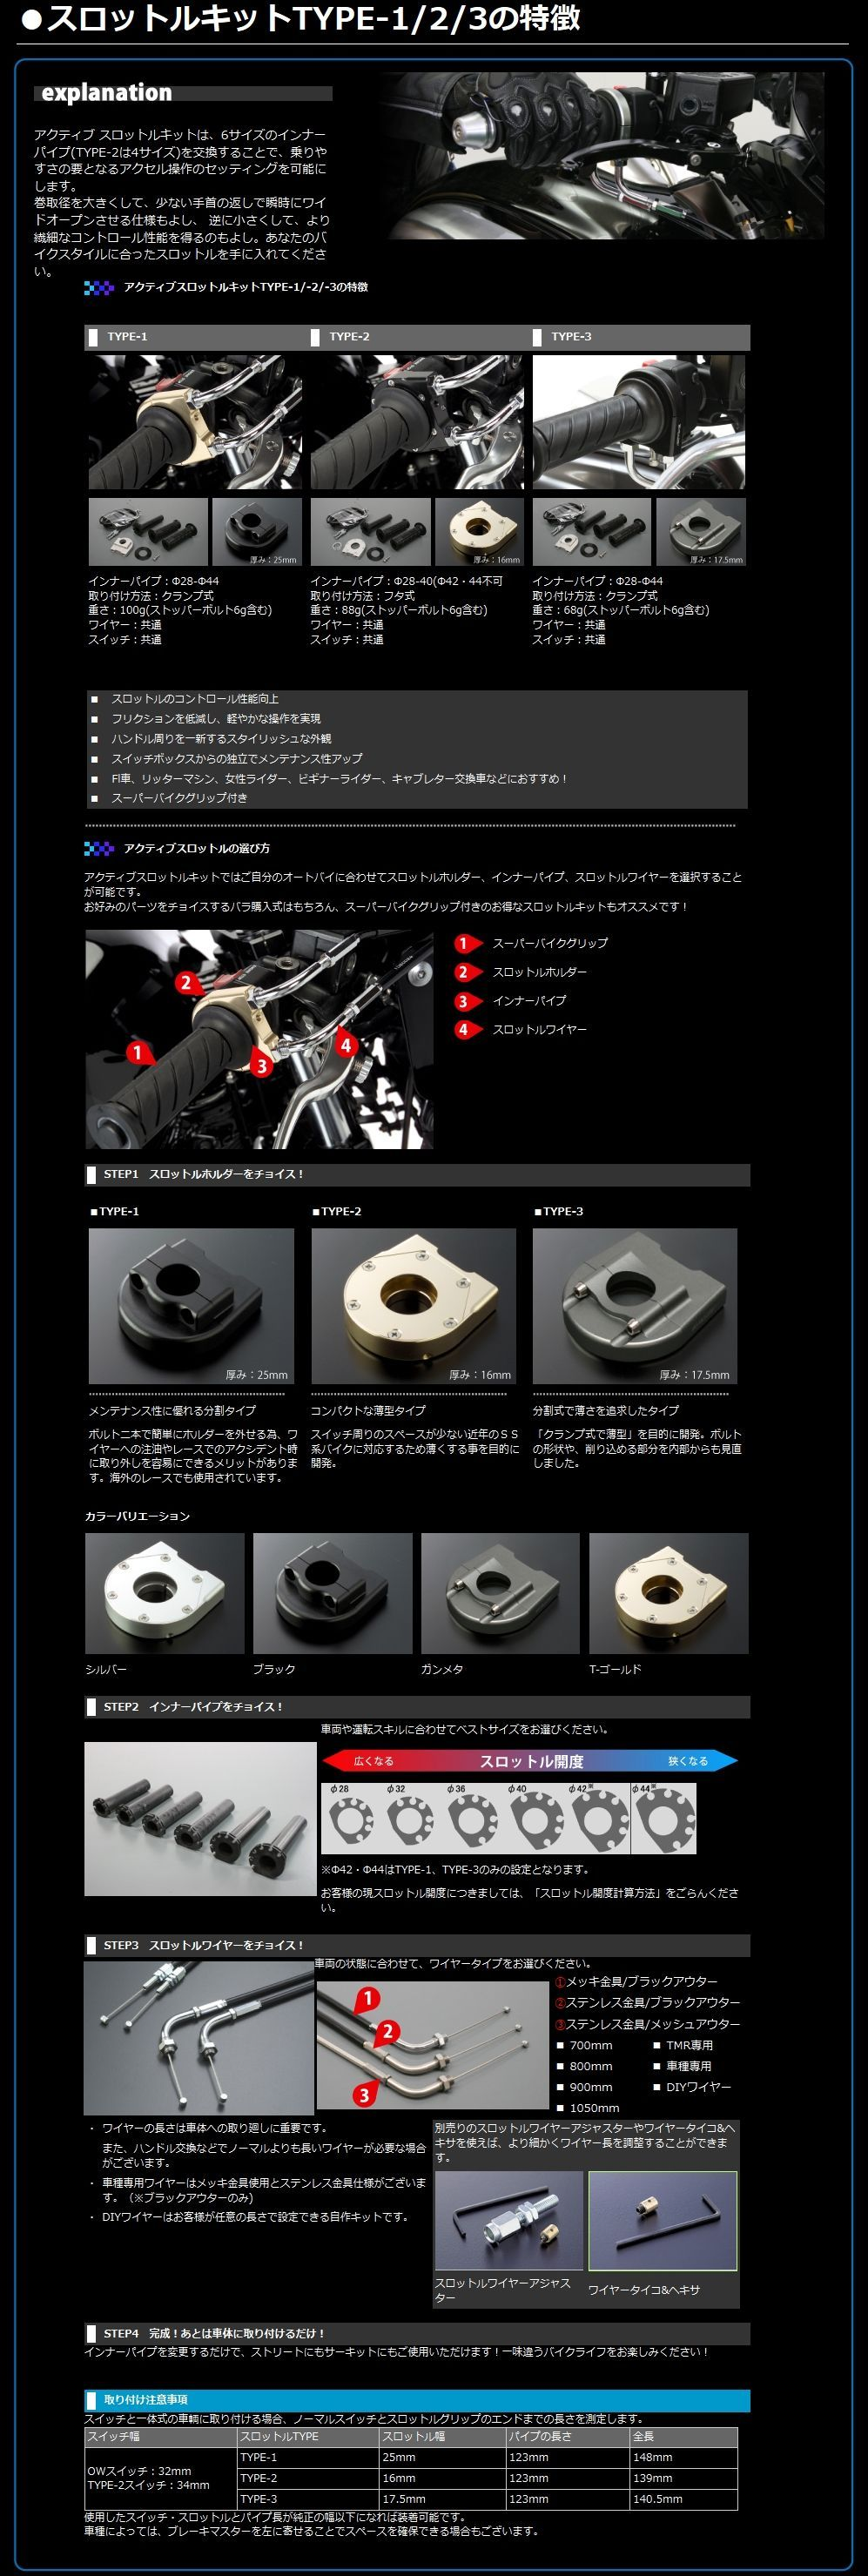 【ACTIVE】Type-3 快速油門組 (車種專用) - 「Webike-摩托百貨」